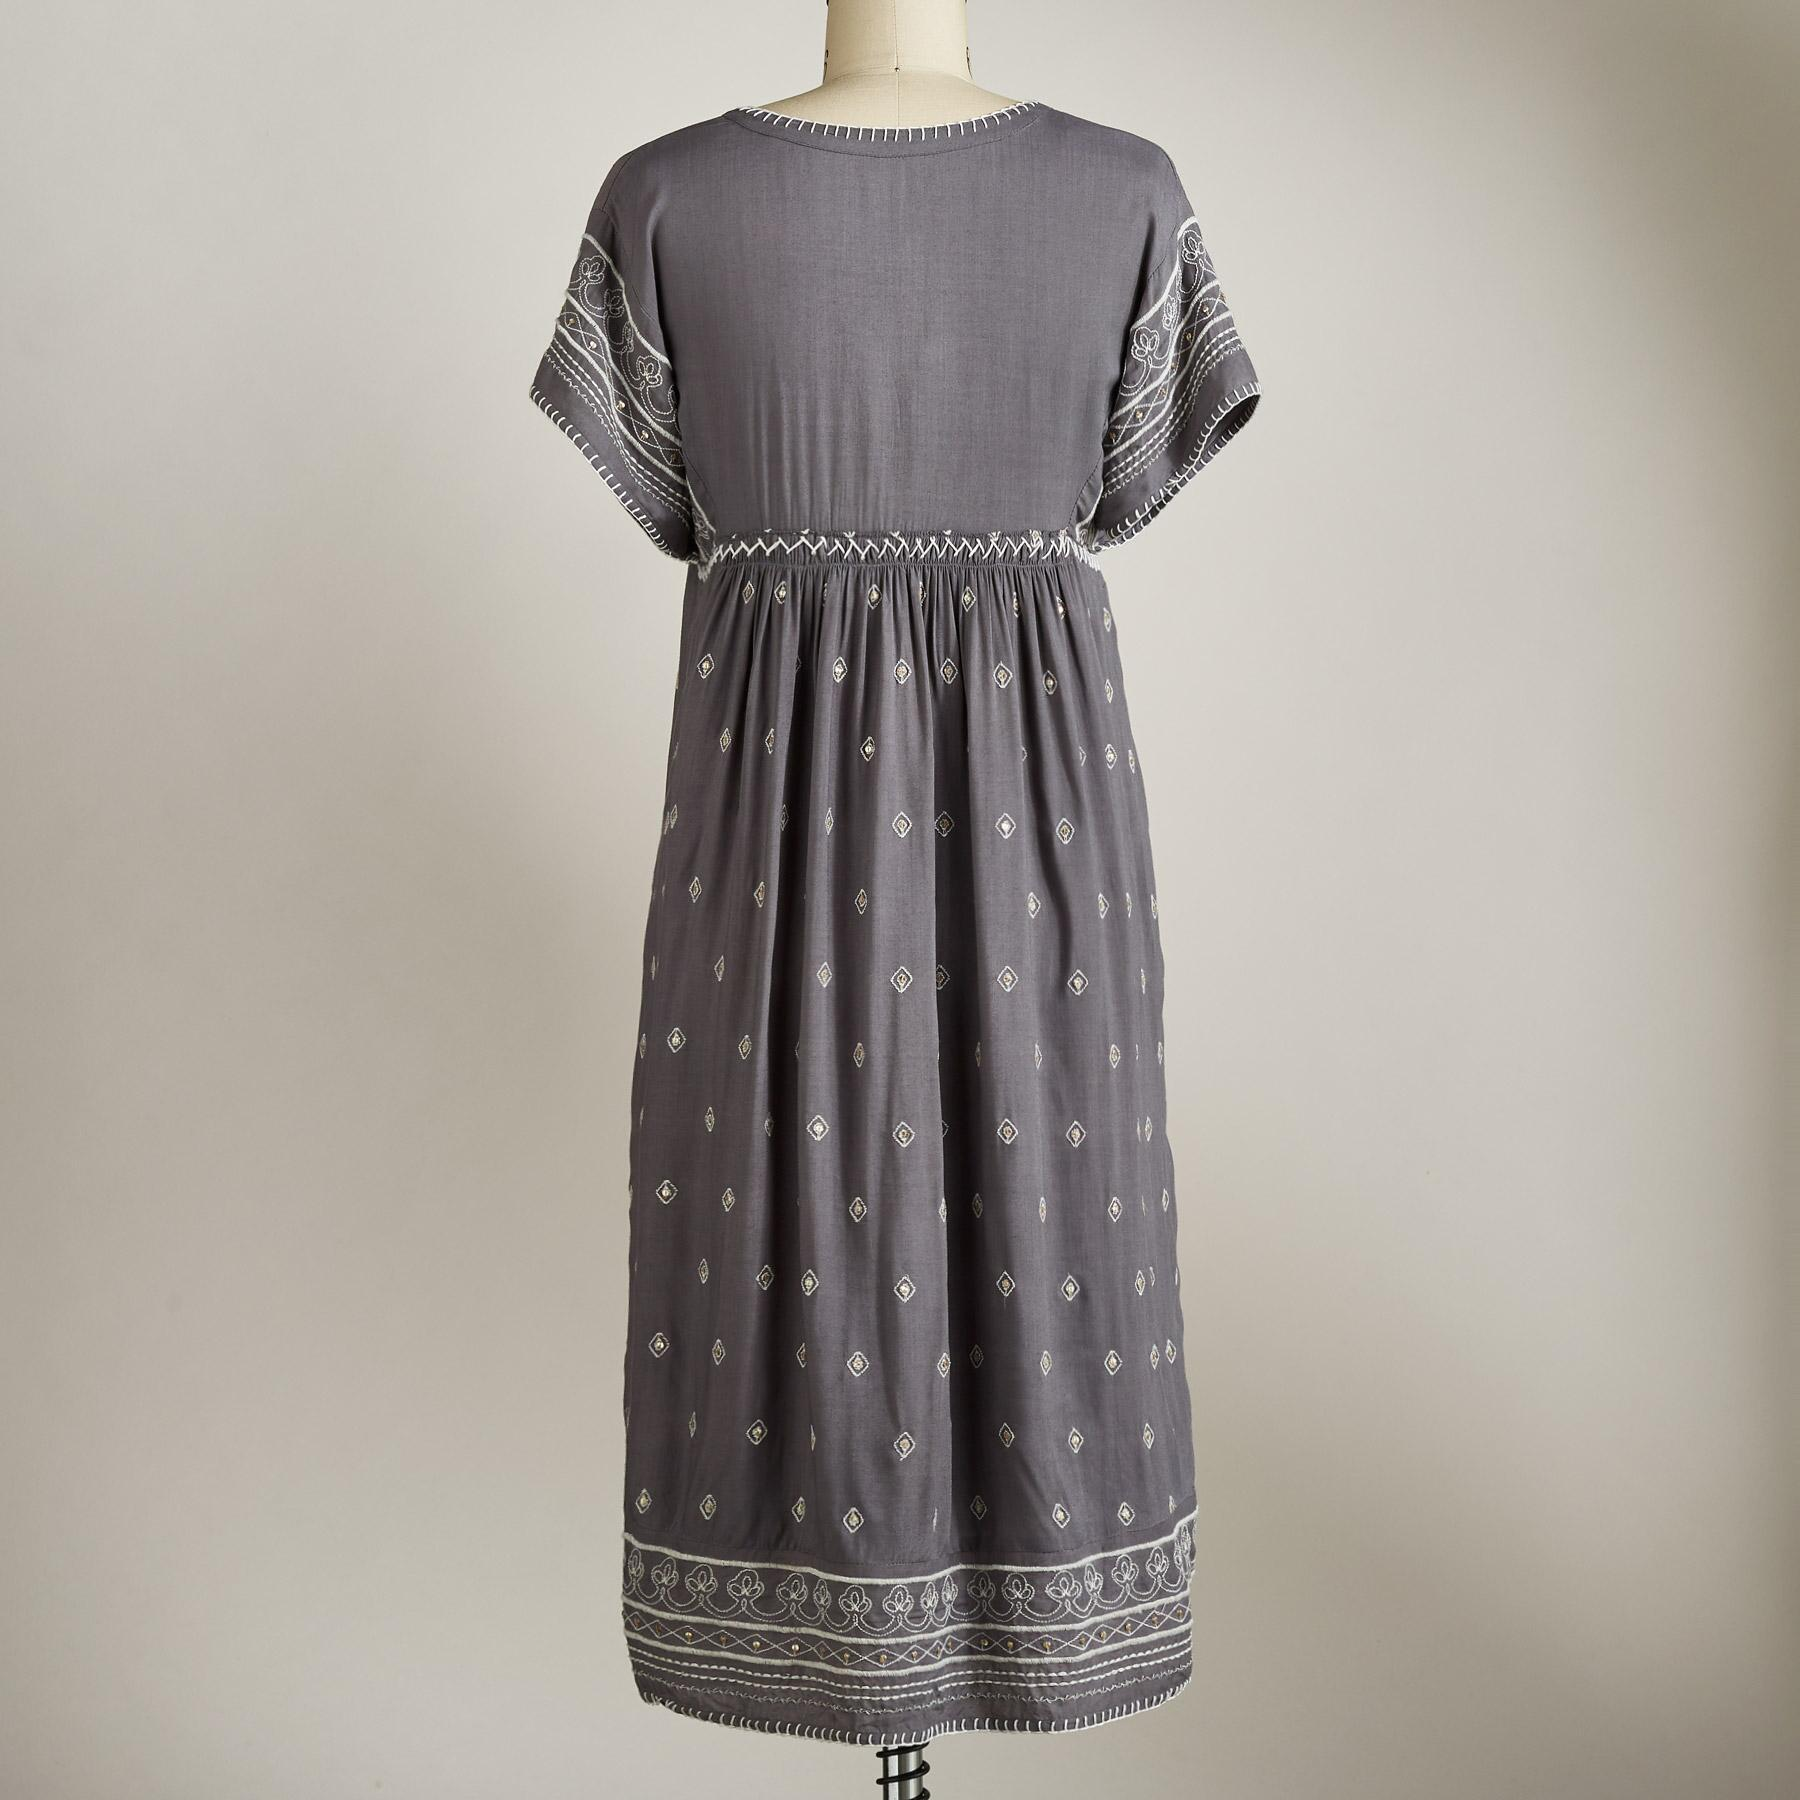 AURA DRESS - PETITES: View 2